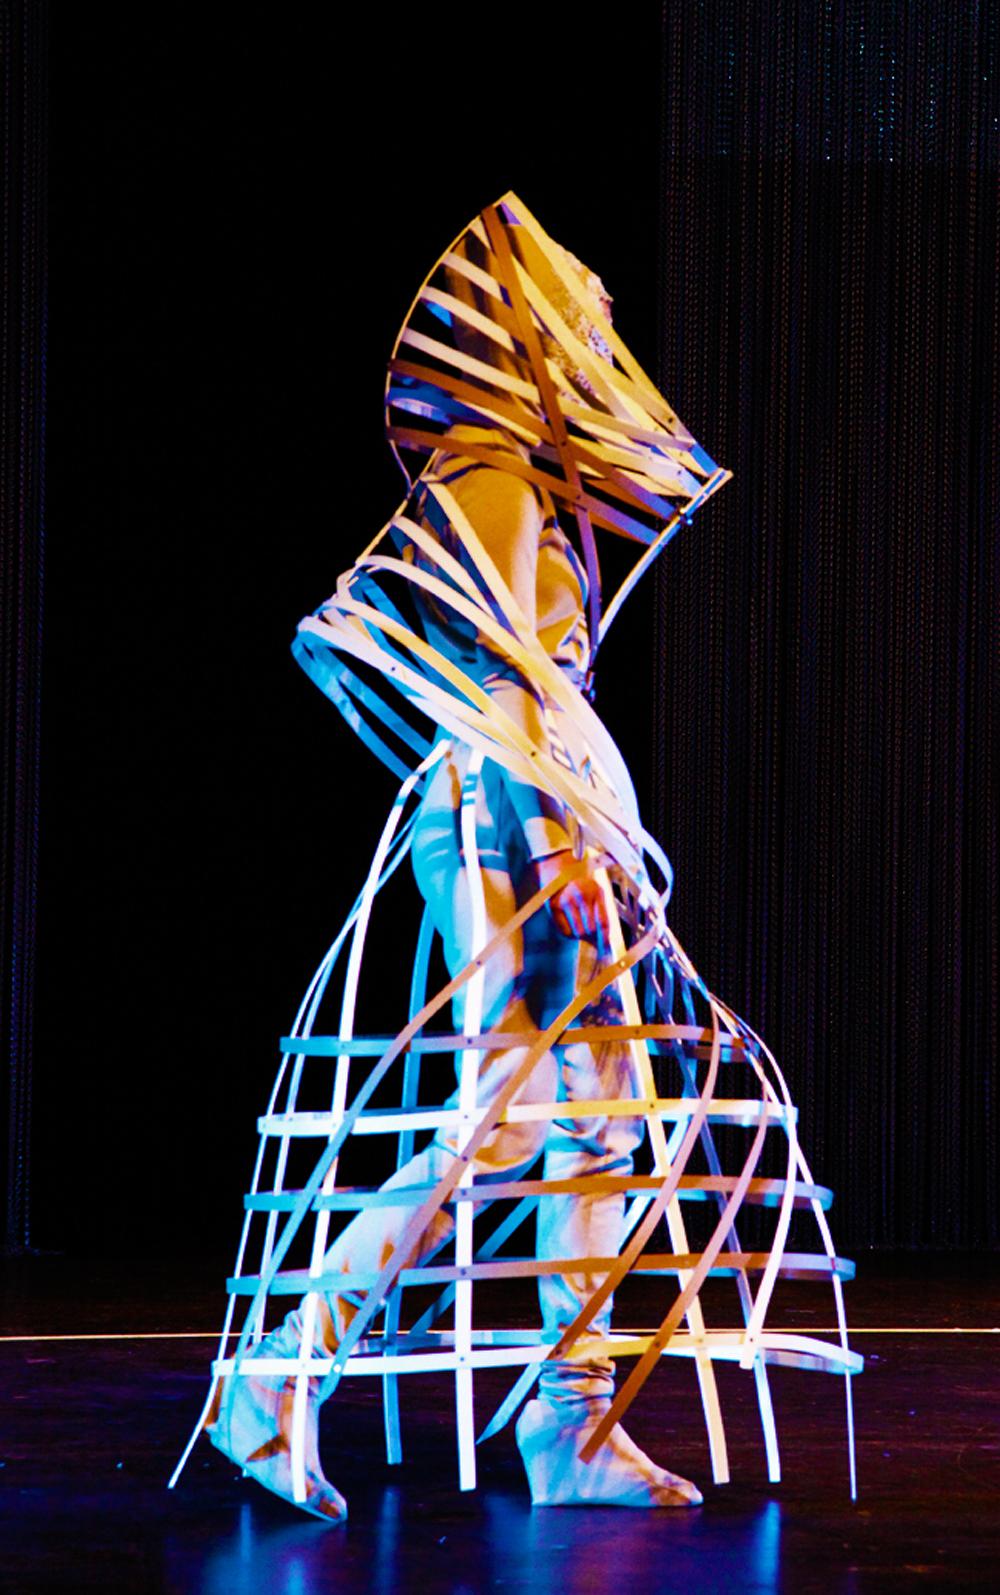 Sainte Catherine Charity-Modeperformance der ESMOD Internationale Kunsthochschule für Mode Berlin /// Wild Things